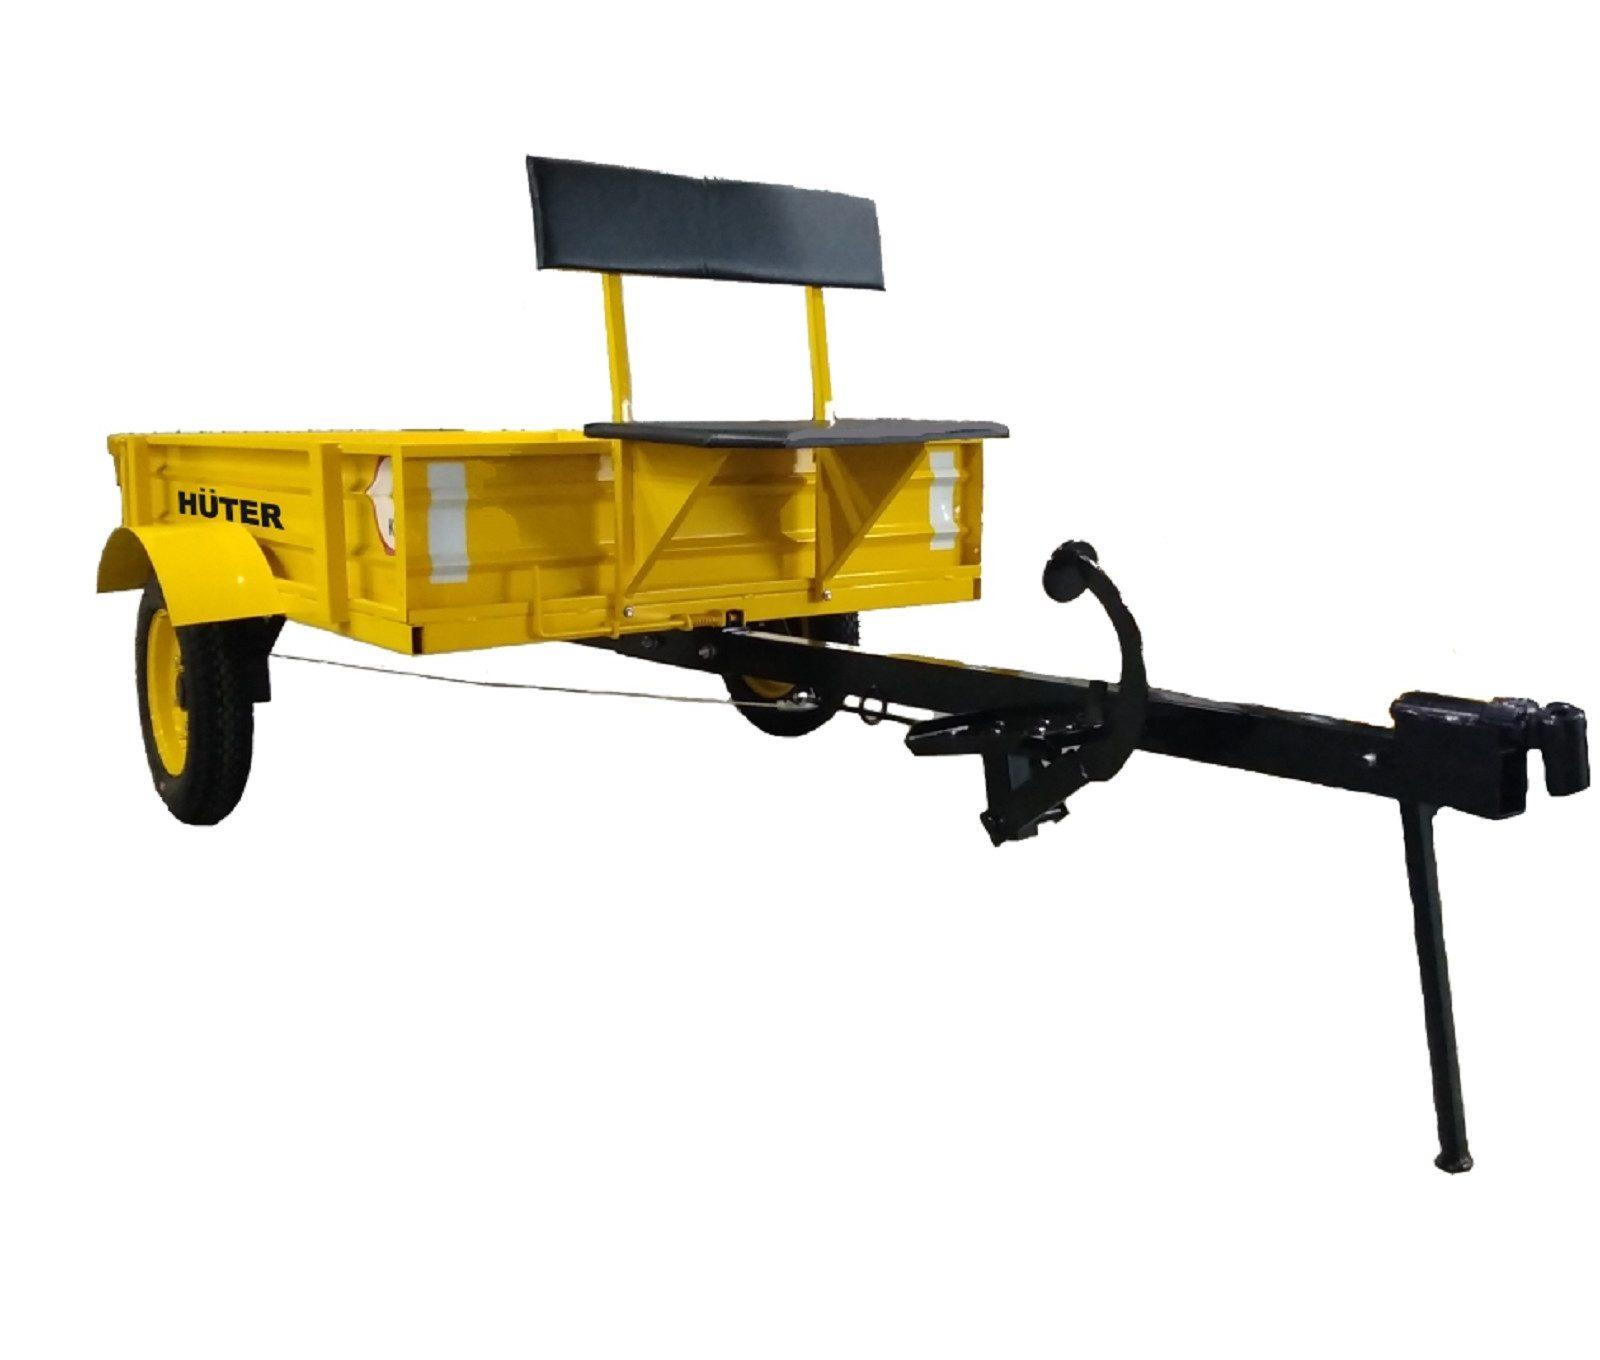 Прицеп для мотоблока Huter (Хутер) 500 кг